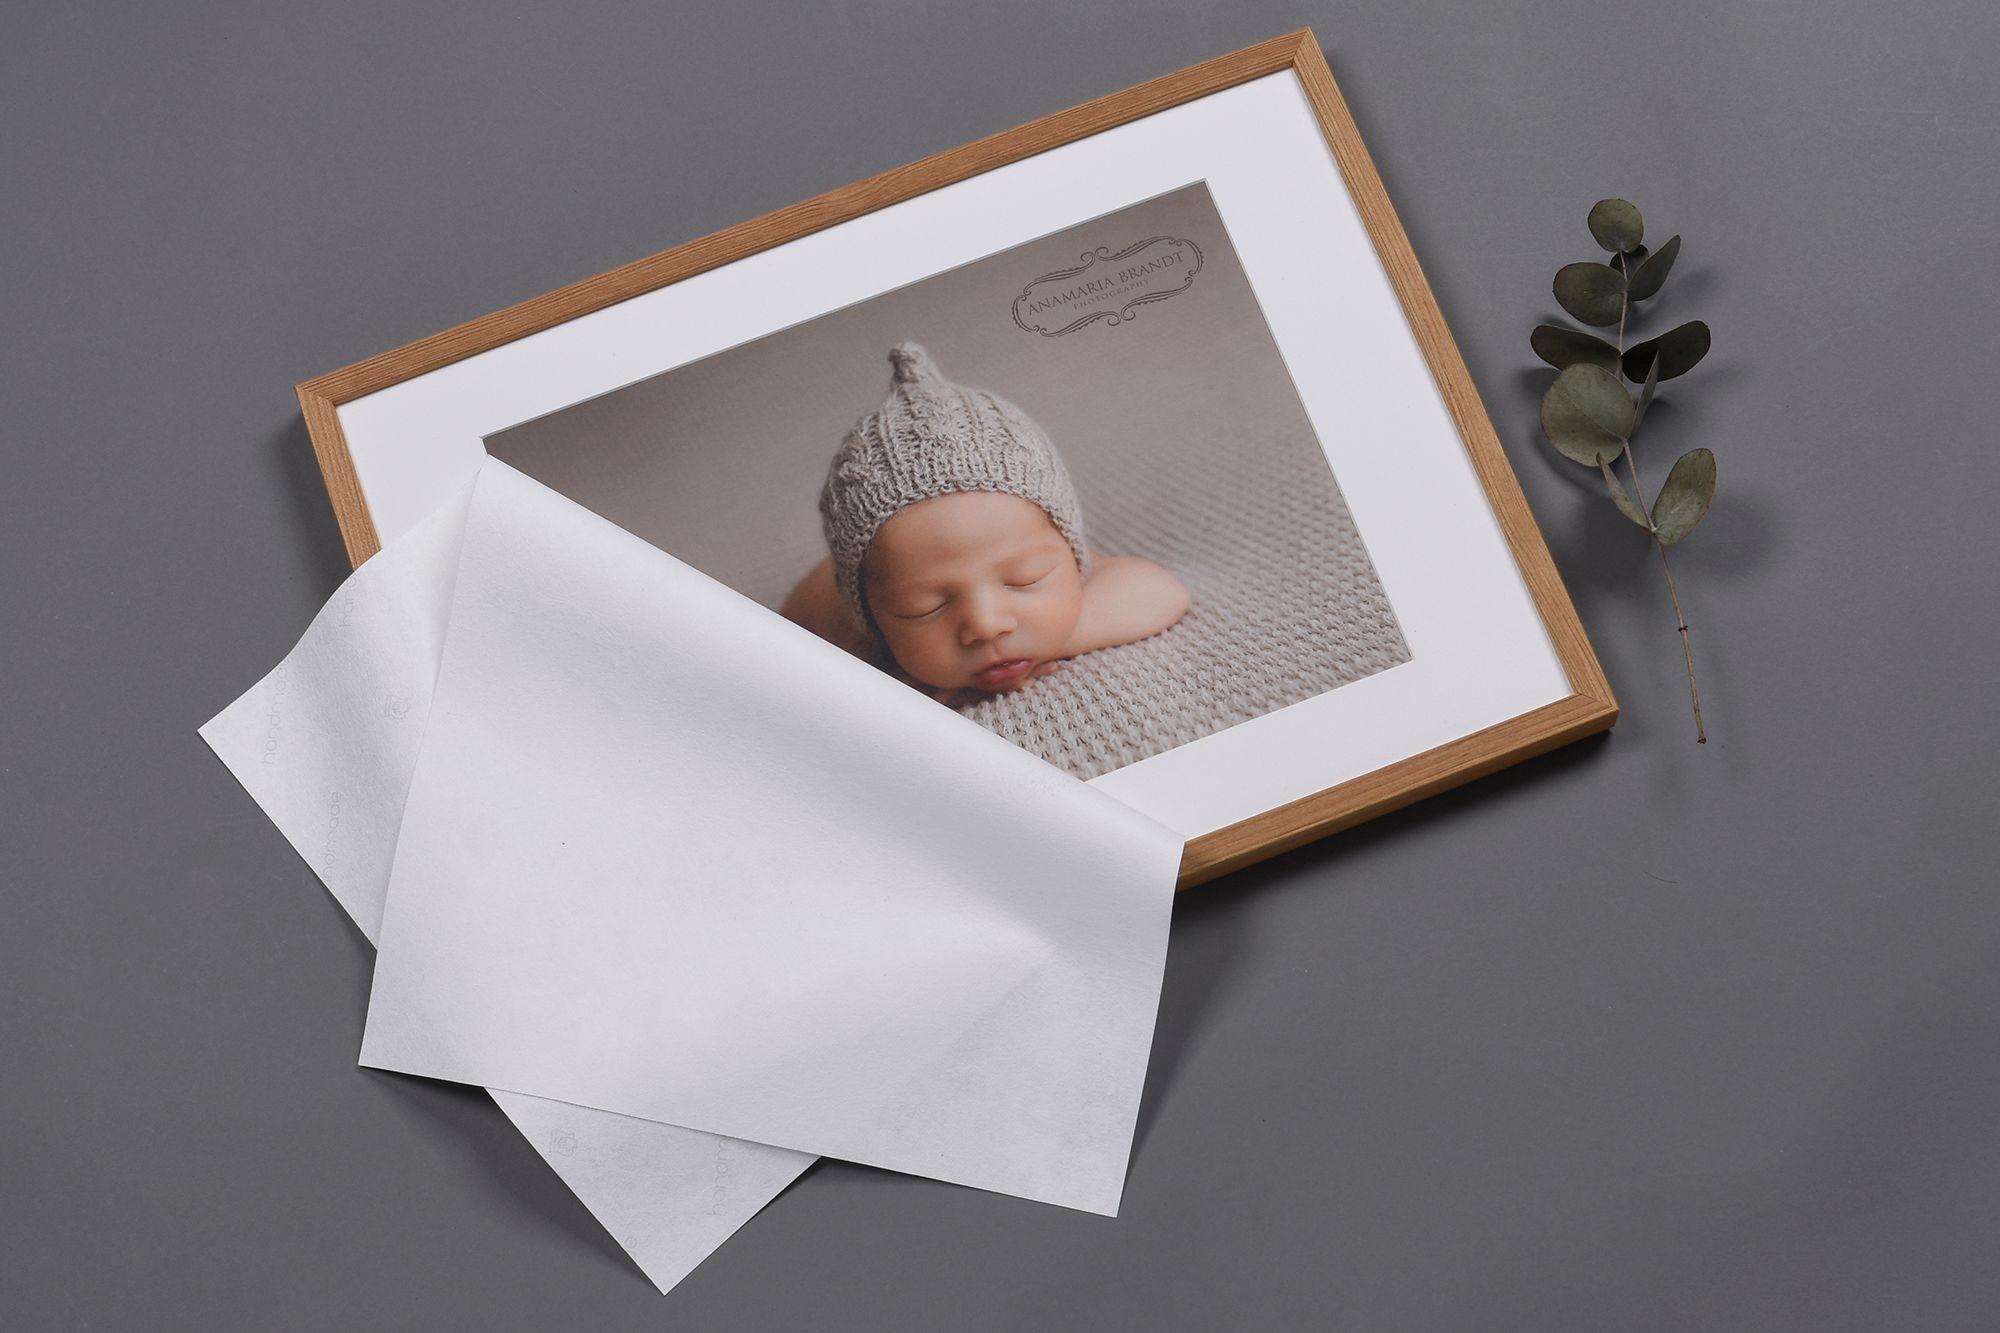 Framed Newborn Photo in Wooden Frame